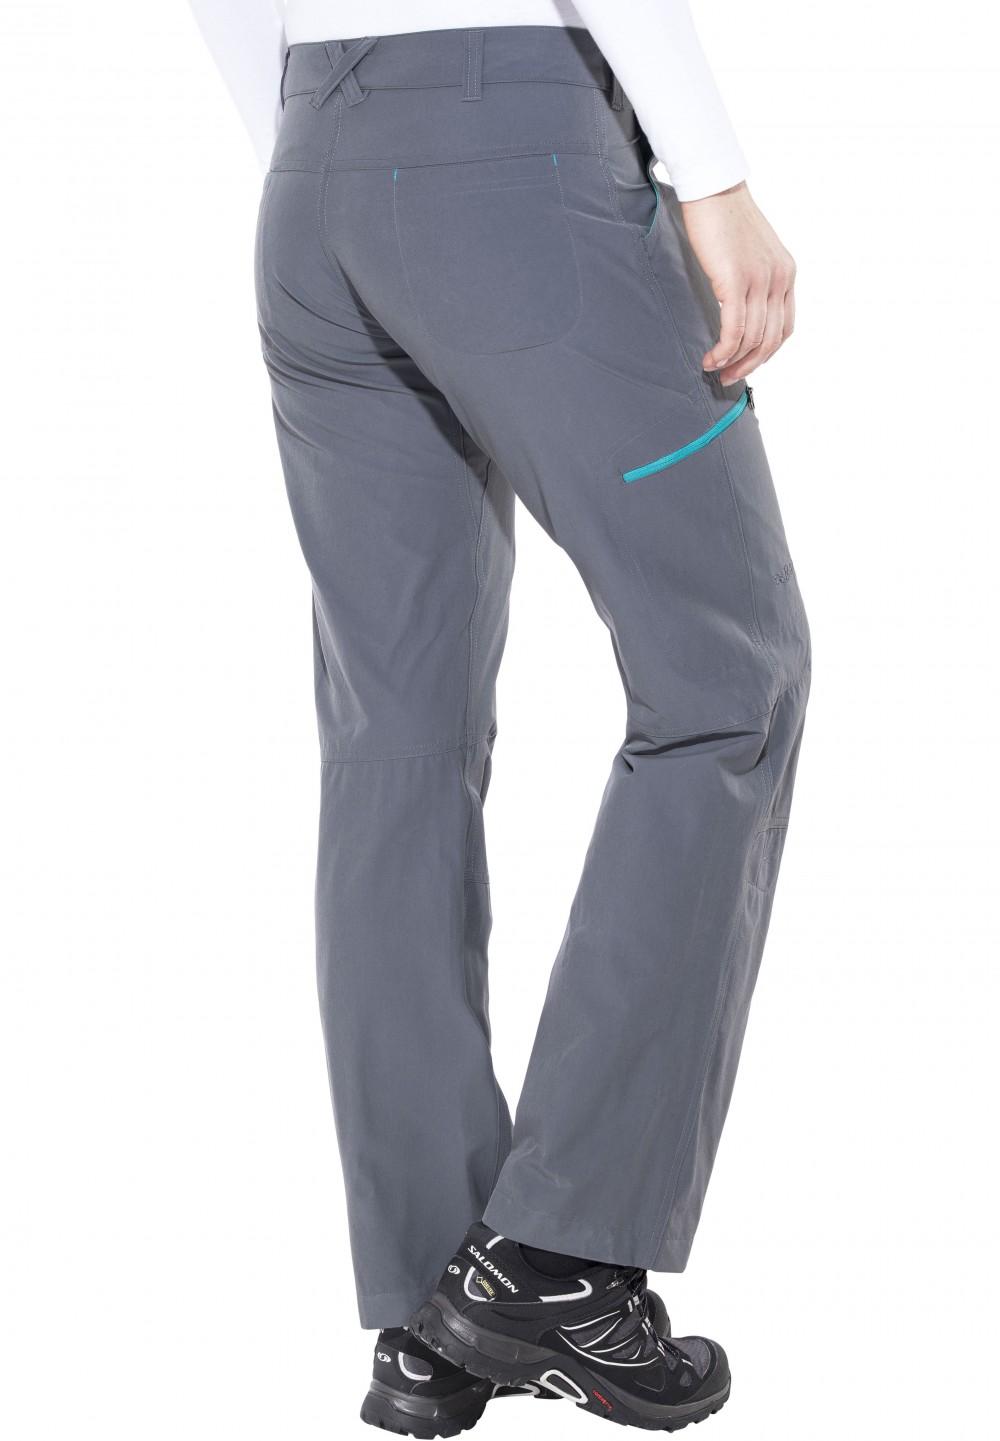 Штаны RAB helix pants lady (размер 12/L-XL) - 2